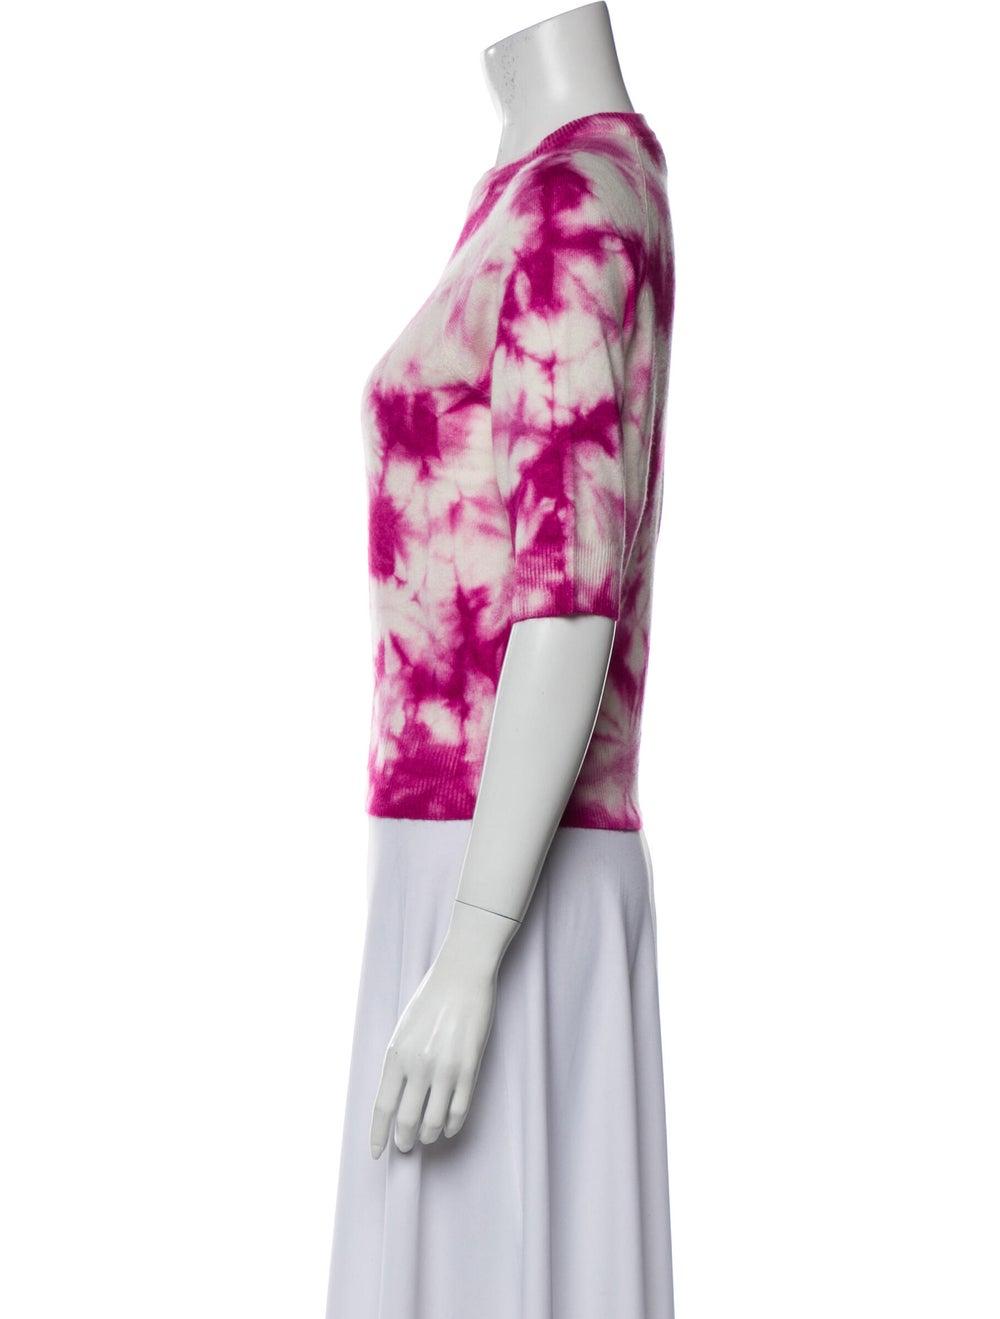 Michael Kors Cashmere Tie-Dye Print Sweater Pink - image 2